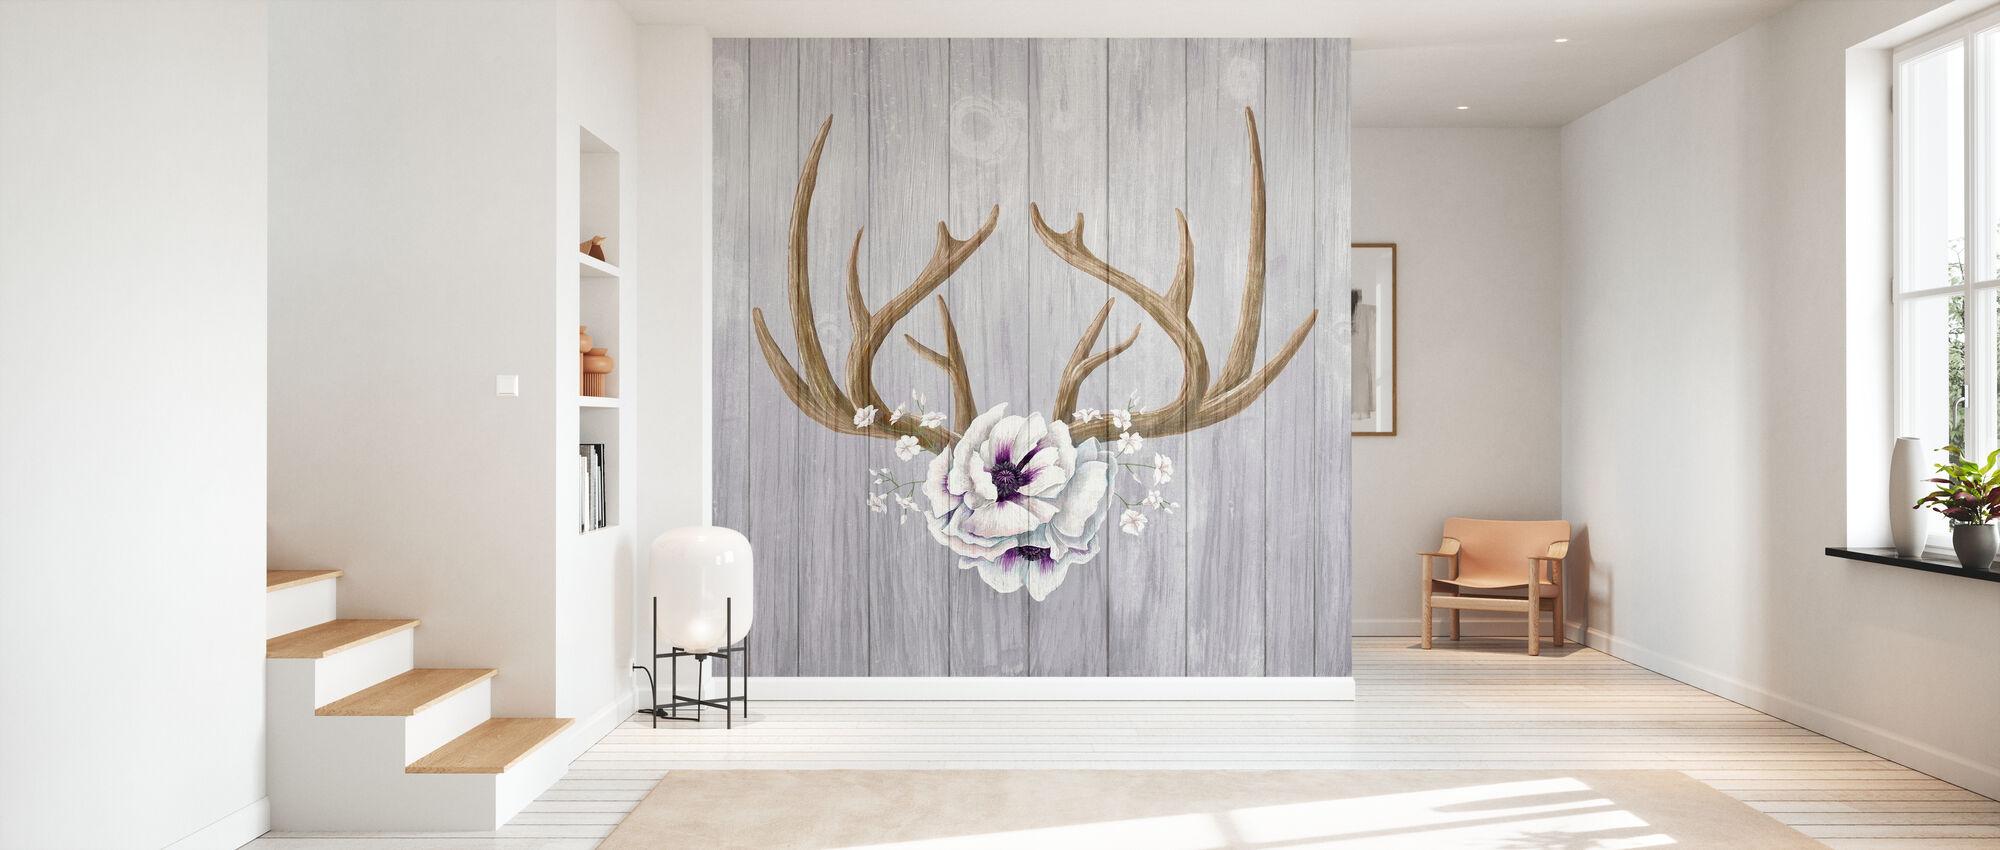 Antlers and Poppies II - Wallpaper - Hallway